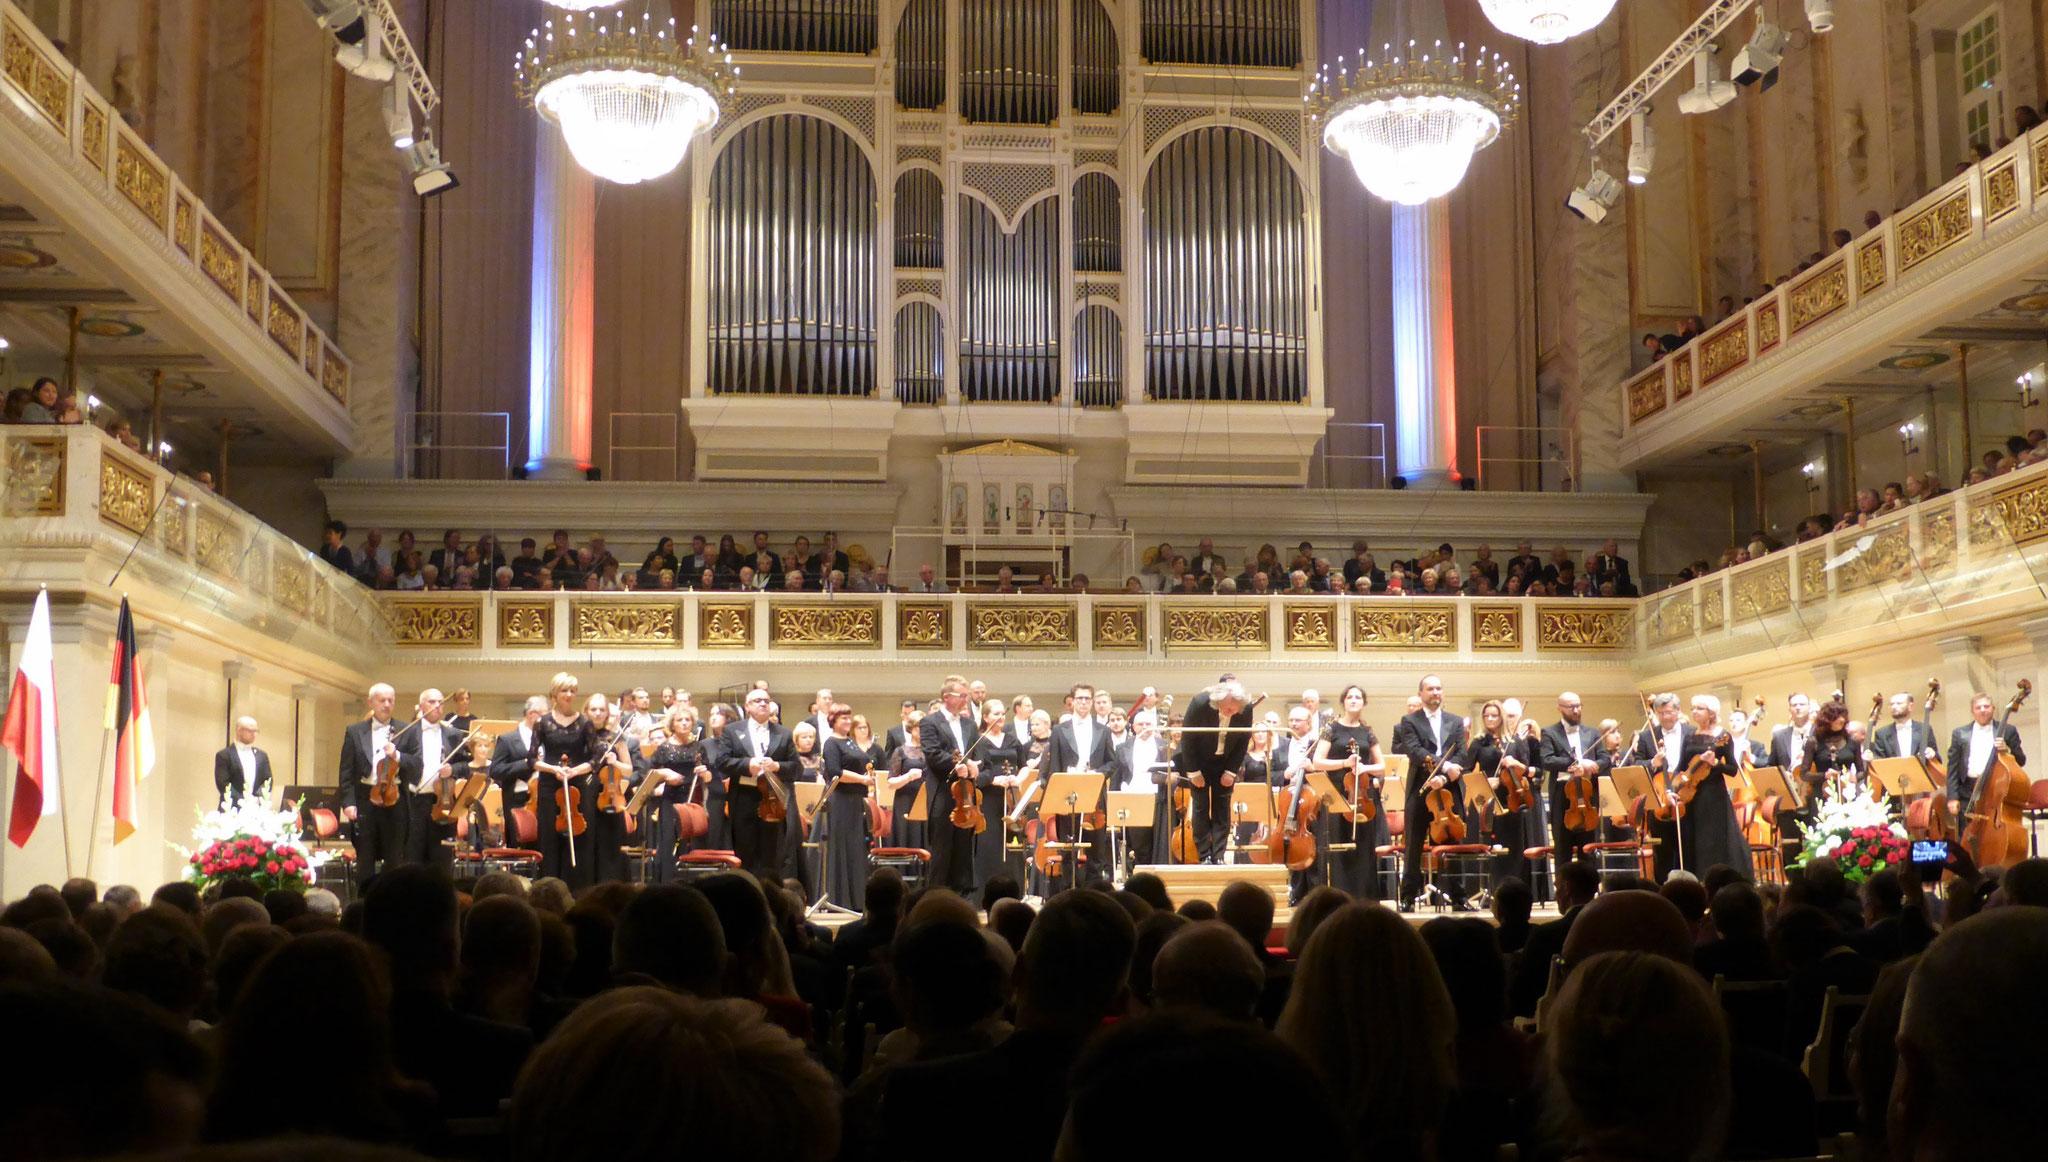 Posener Philharmonie